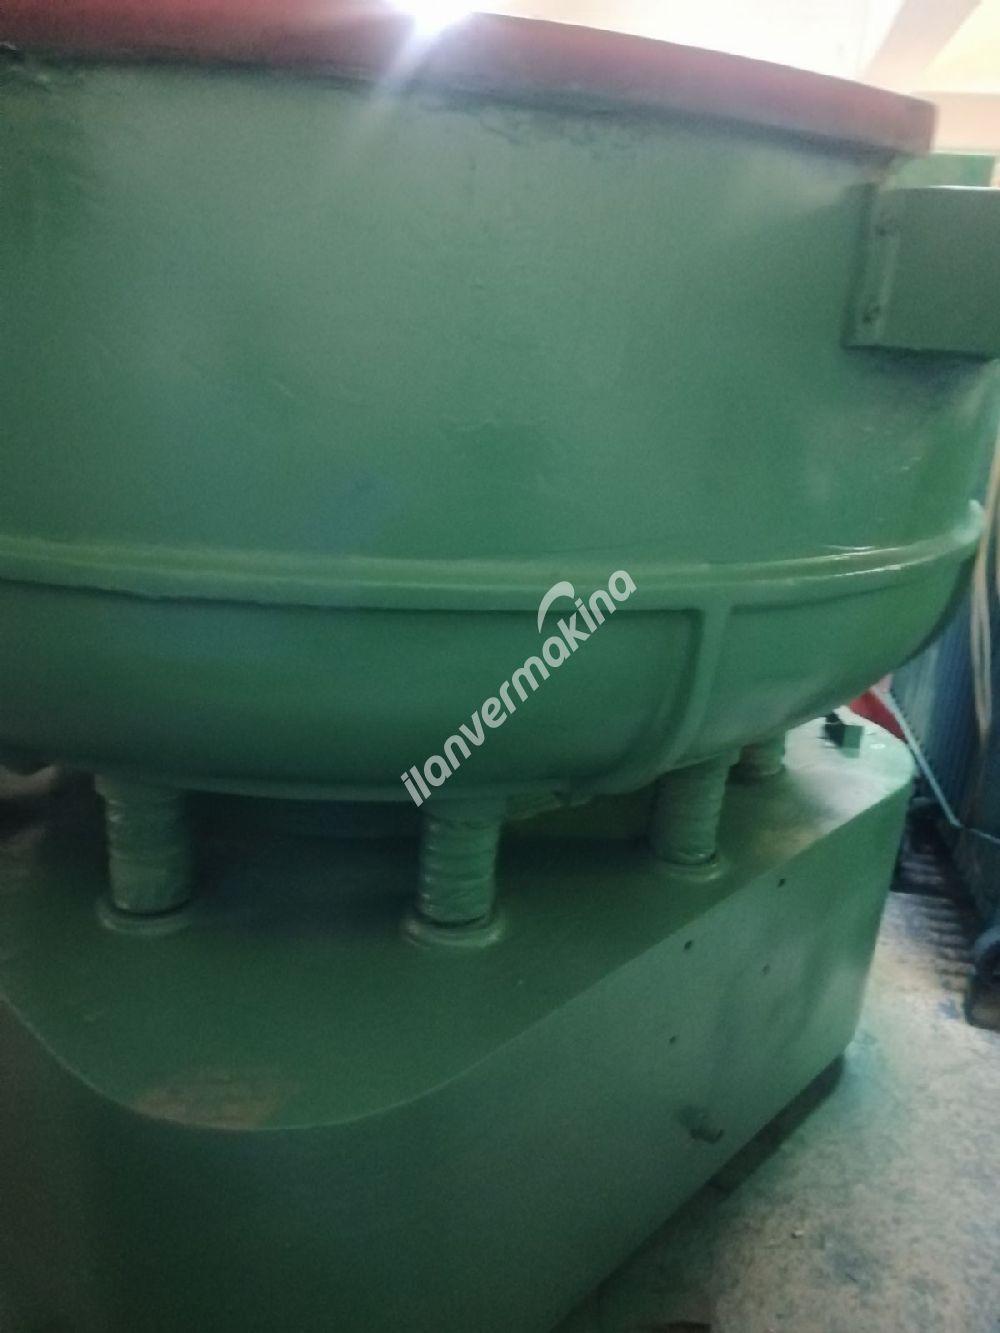 Vibrasyon çapak alma parlatma makinası 800 litre